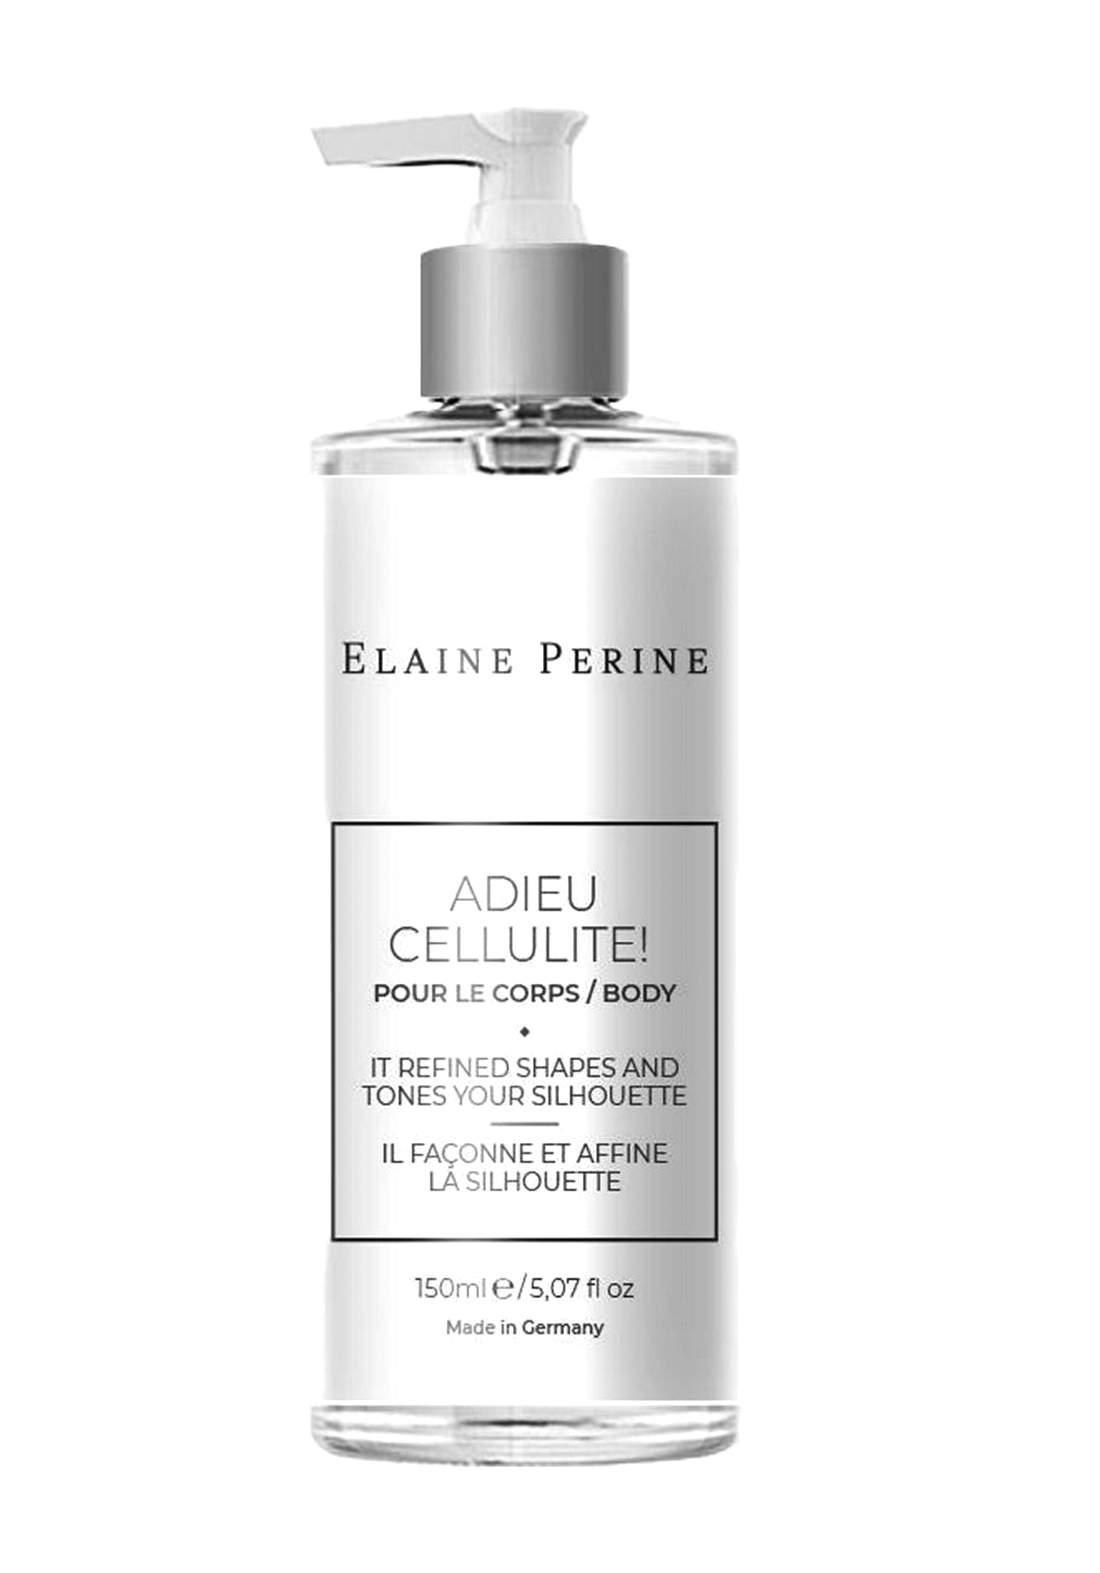 Elaine Perine Adieu Cellulite 150ml كريم طبي معالج للسلولايت